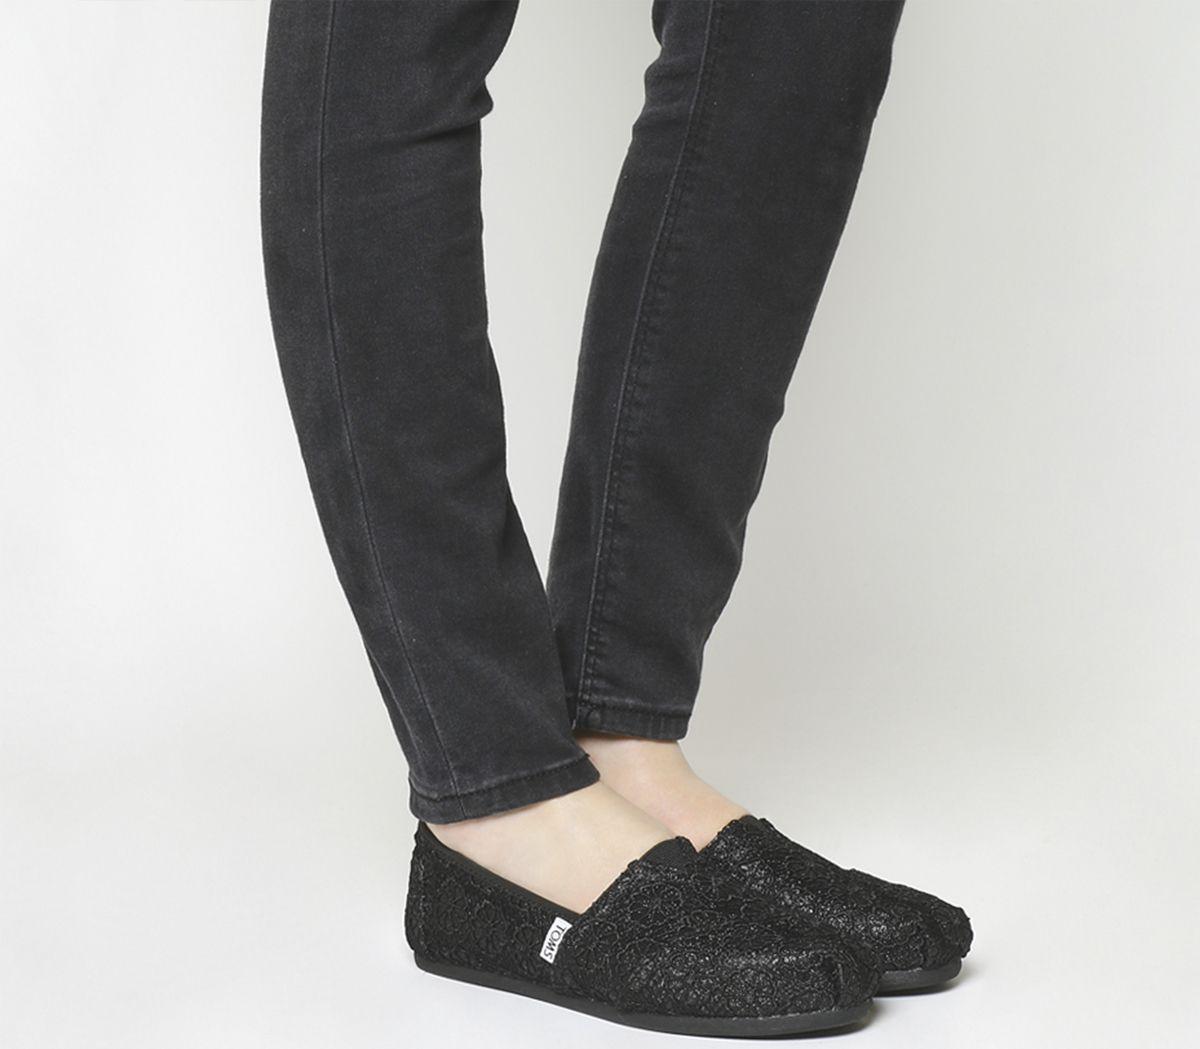 a682da5a2e9b Toms Seasonal Classic Slip Ons Black Crochet Glitter - Flats